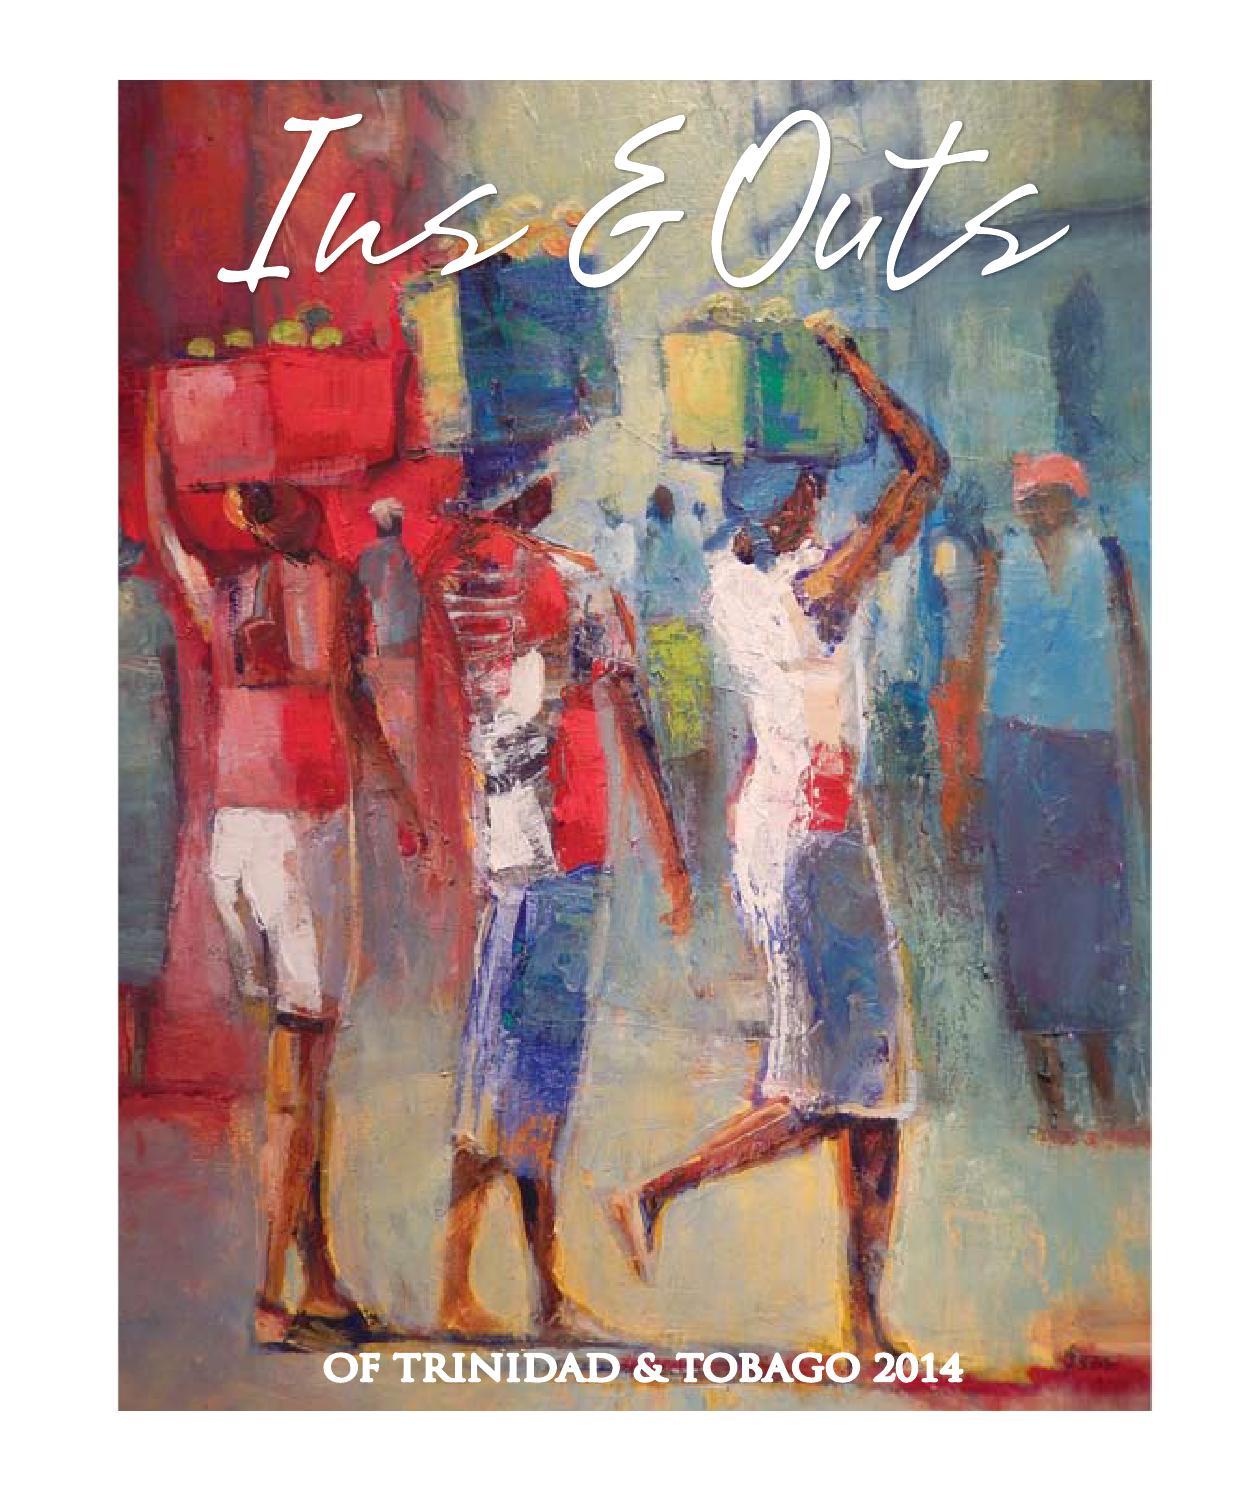 765f12e1a9f Ins   Outs of Trinidad   Tobago 2014 by Prestige Business Publications Ltd.  - issuu